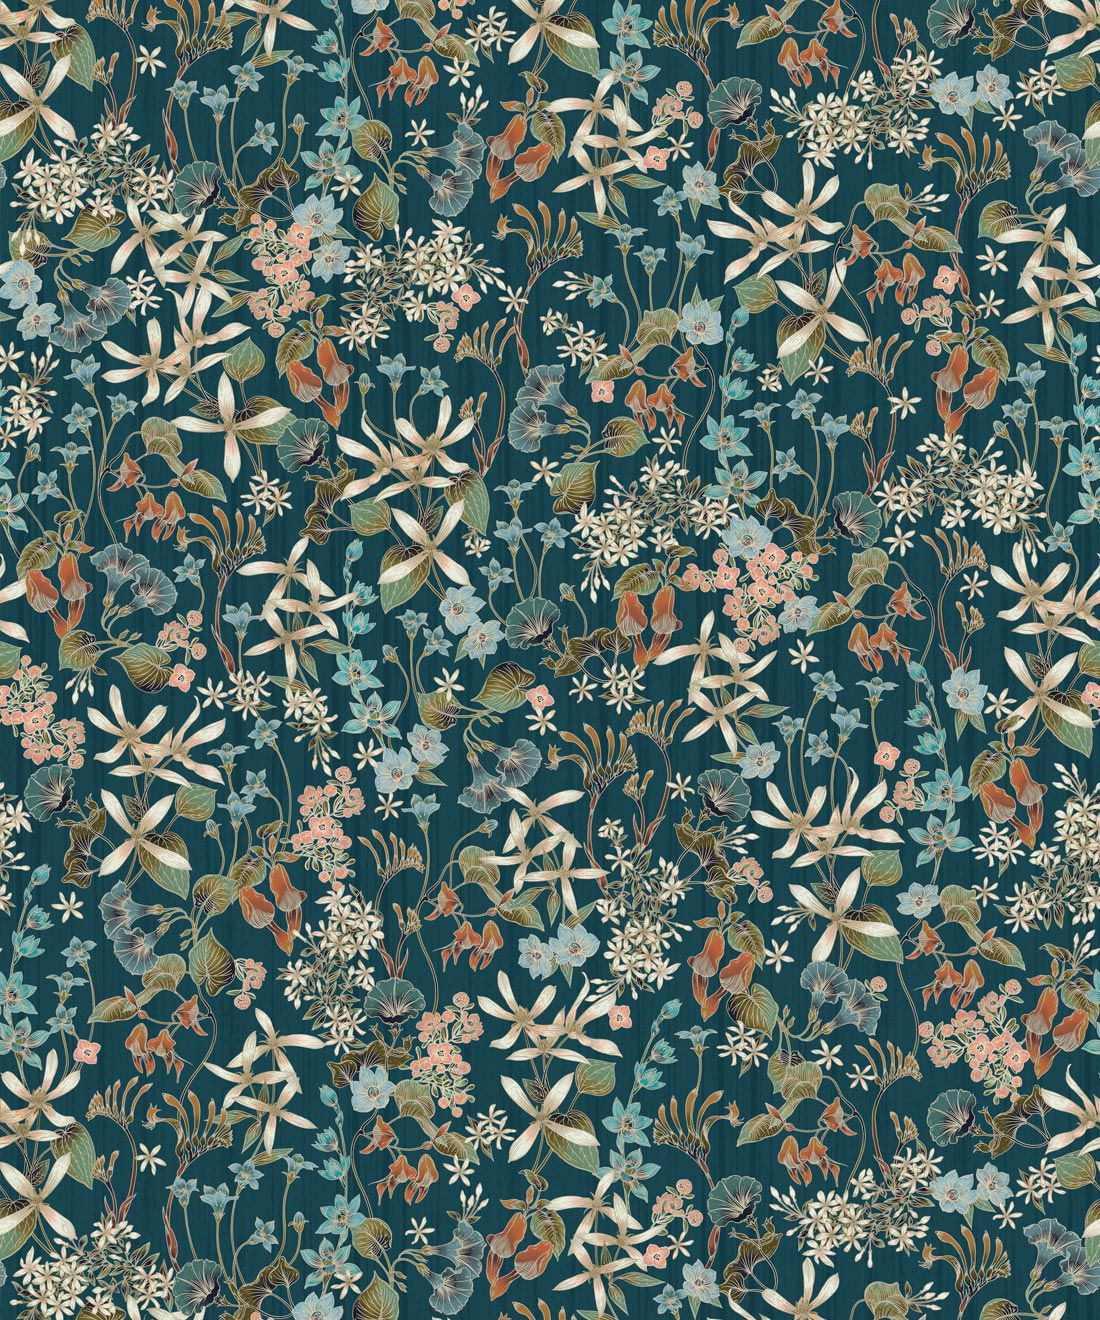 County Flowers Wallpaper • Eloise Short • Vintage Floral Wallpaper •Granny Chic Wallpaper • Grandmillennial Style Wallpaper •Peacock •Swatch